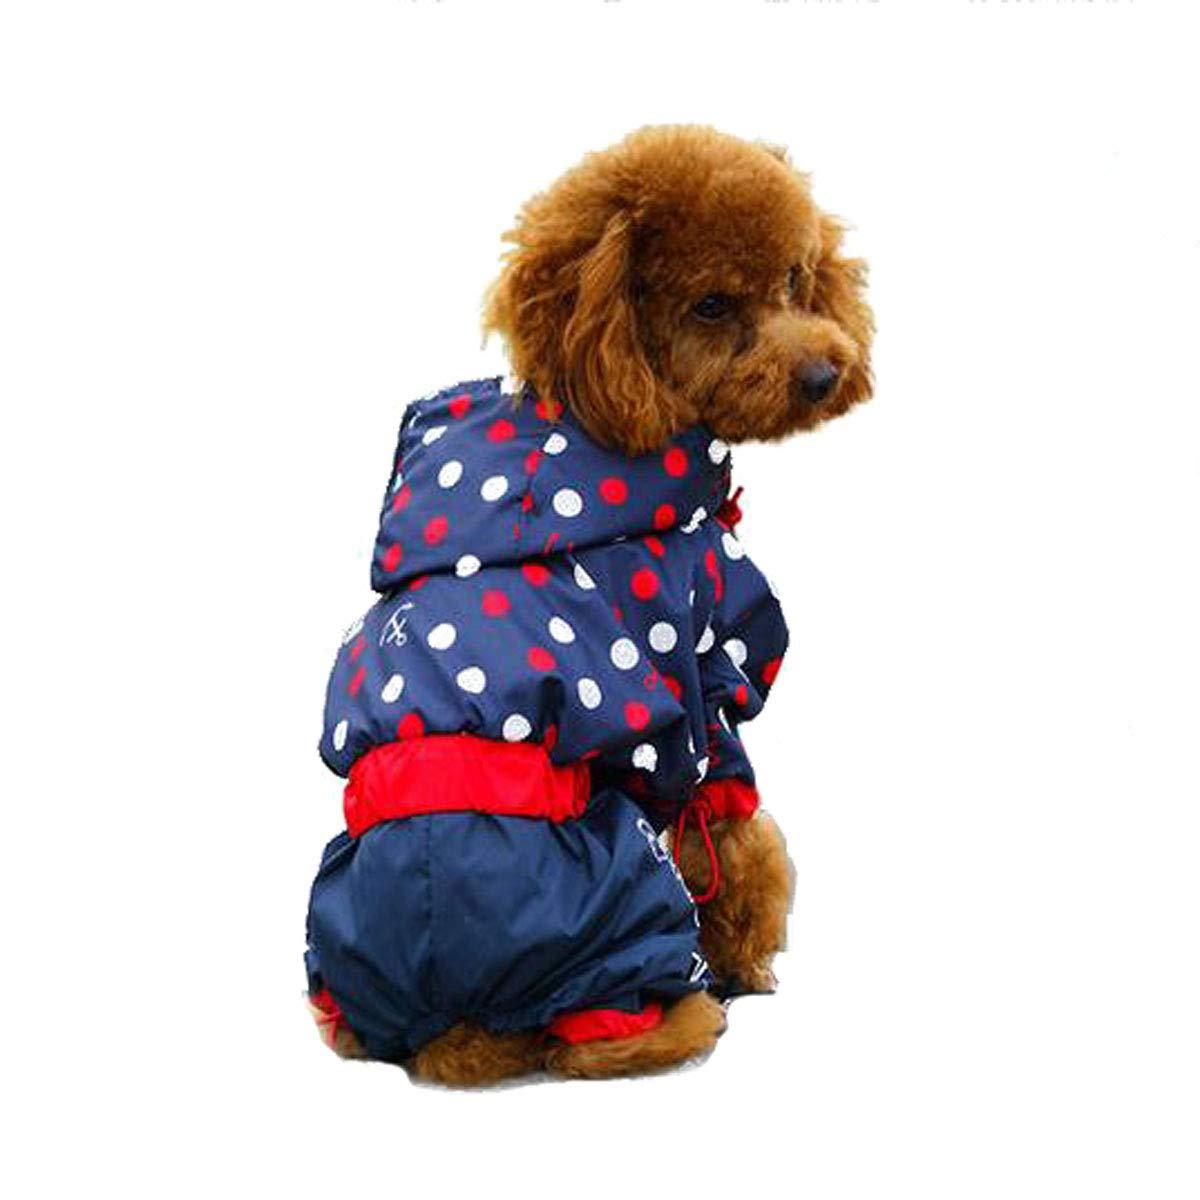 bluee 16  bluee 16  Qiyuezhuangshi Puppy Raincoat, Pet Waterproof Suit, Teddy Four-Legged Raincoat Exquisite (color   bluee, Size   16 )